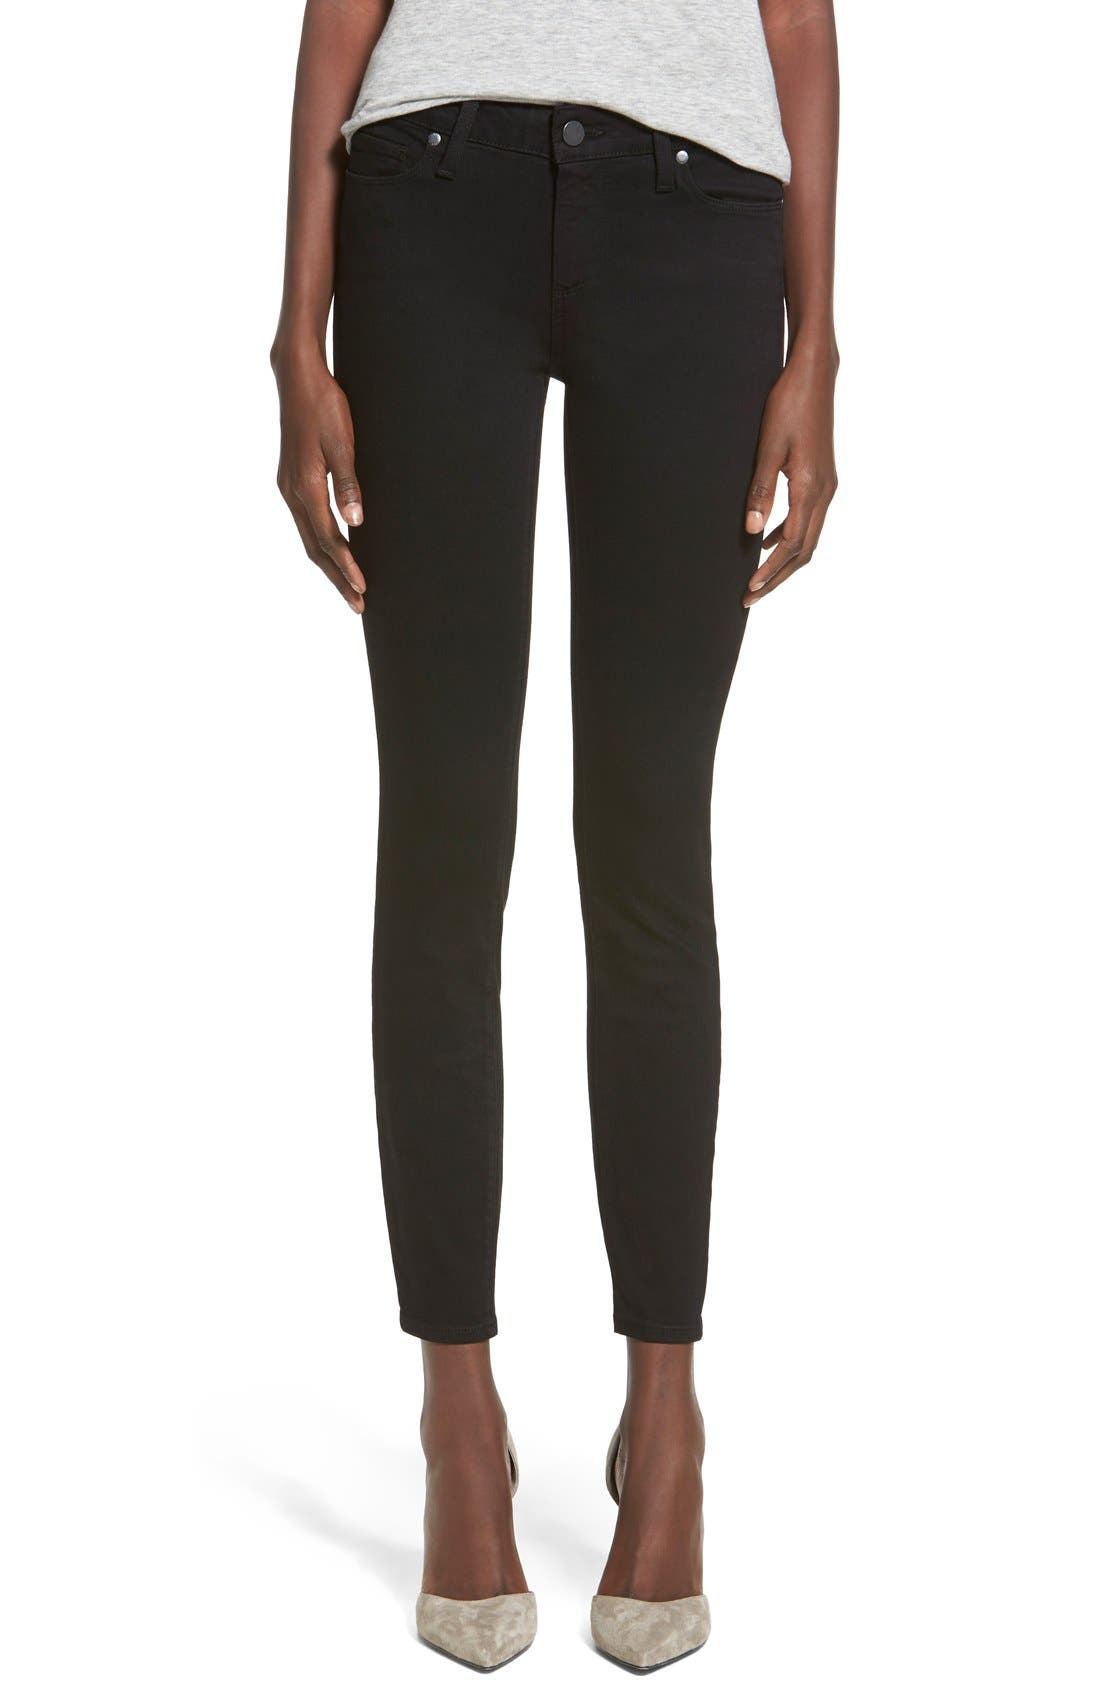 Main Image - PAIGE 'Transcend - Verdugo' Ankle Ultra Skinny Jeans (Black Shadow)